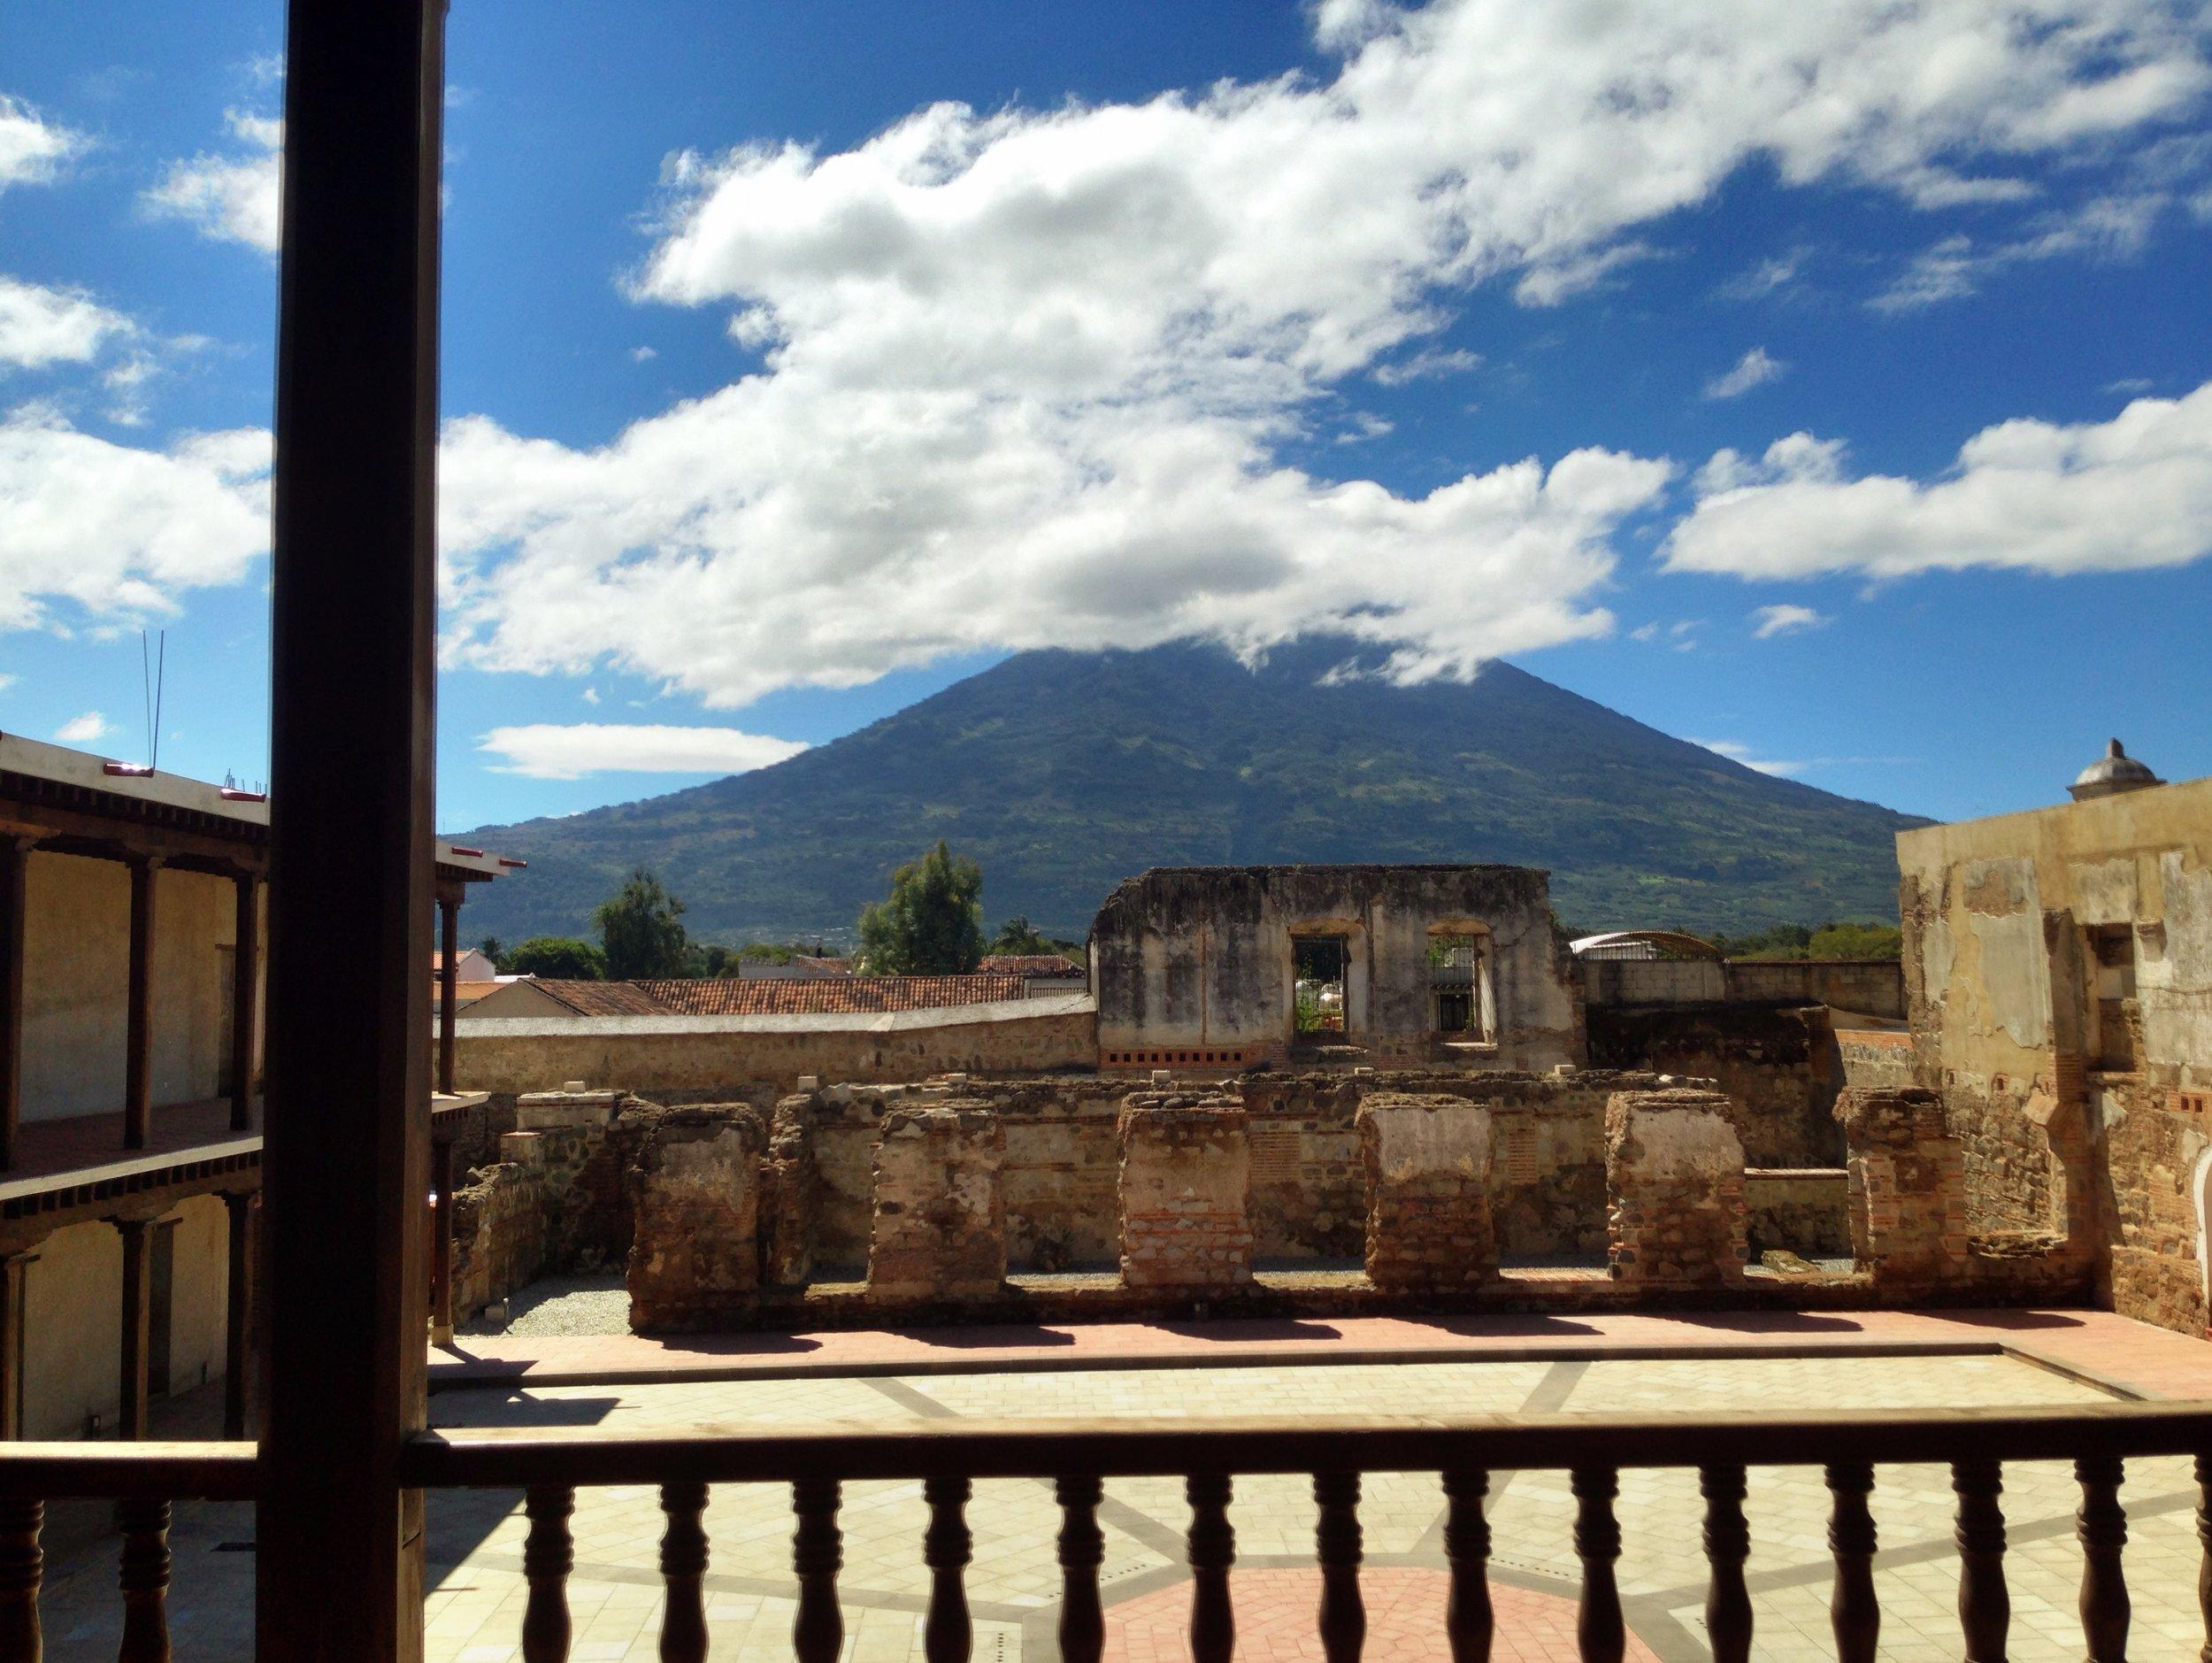 GUATEMALA - Capitanes Generales Palace, Antigua Guatemala